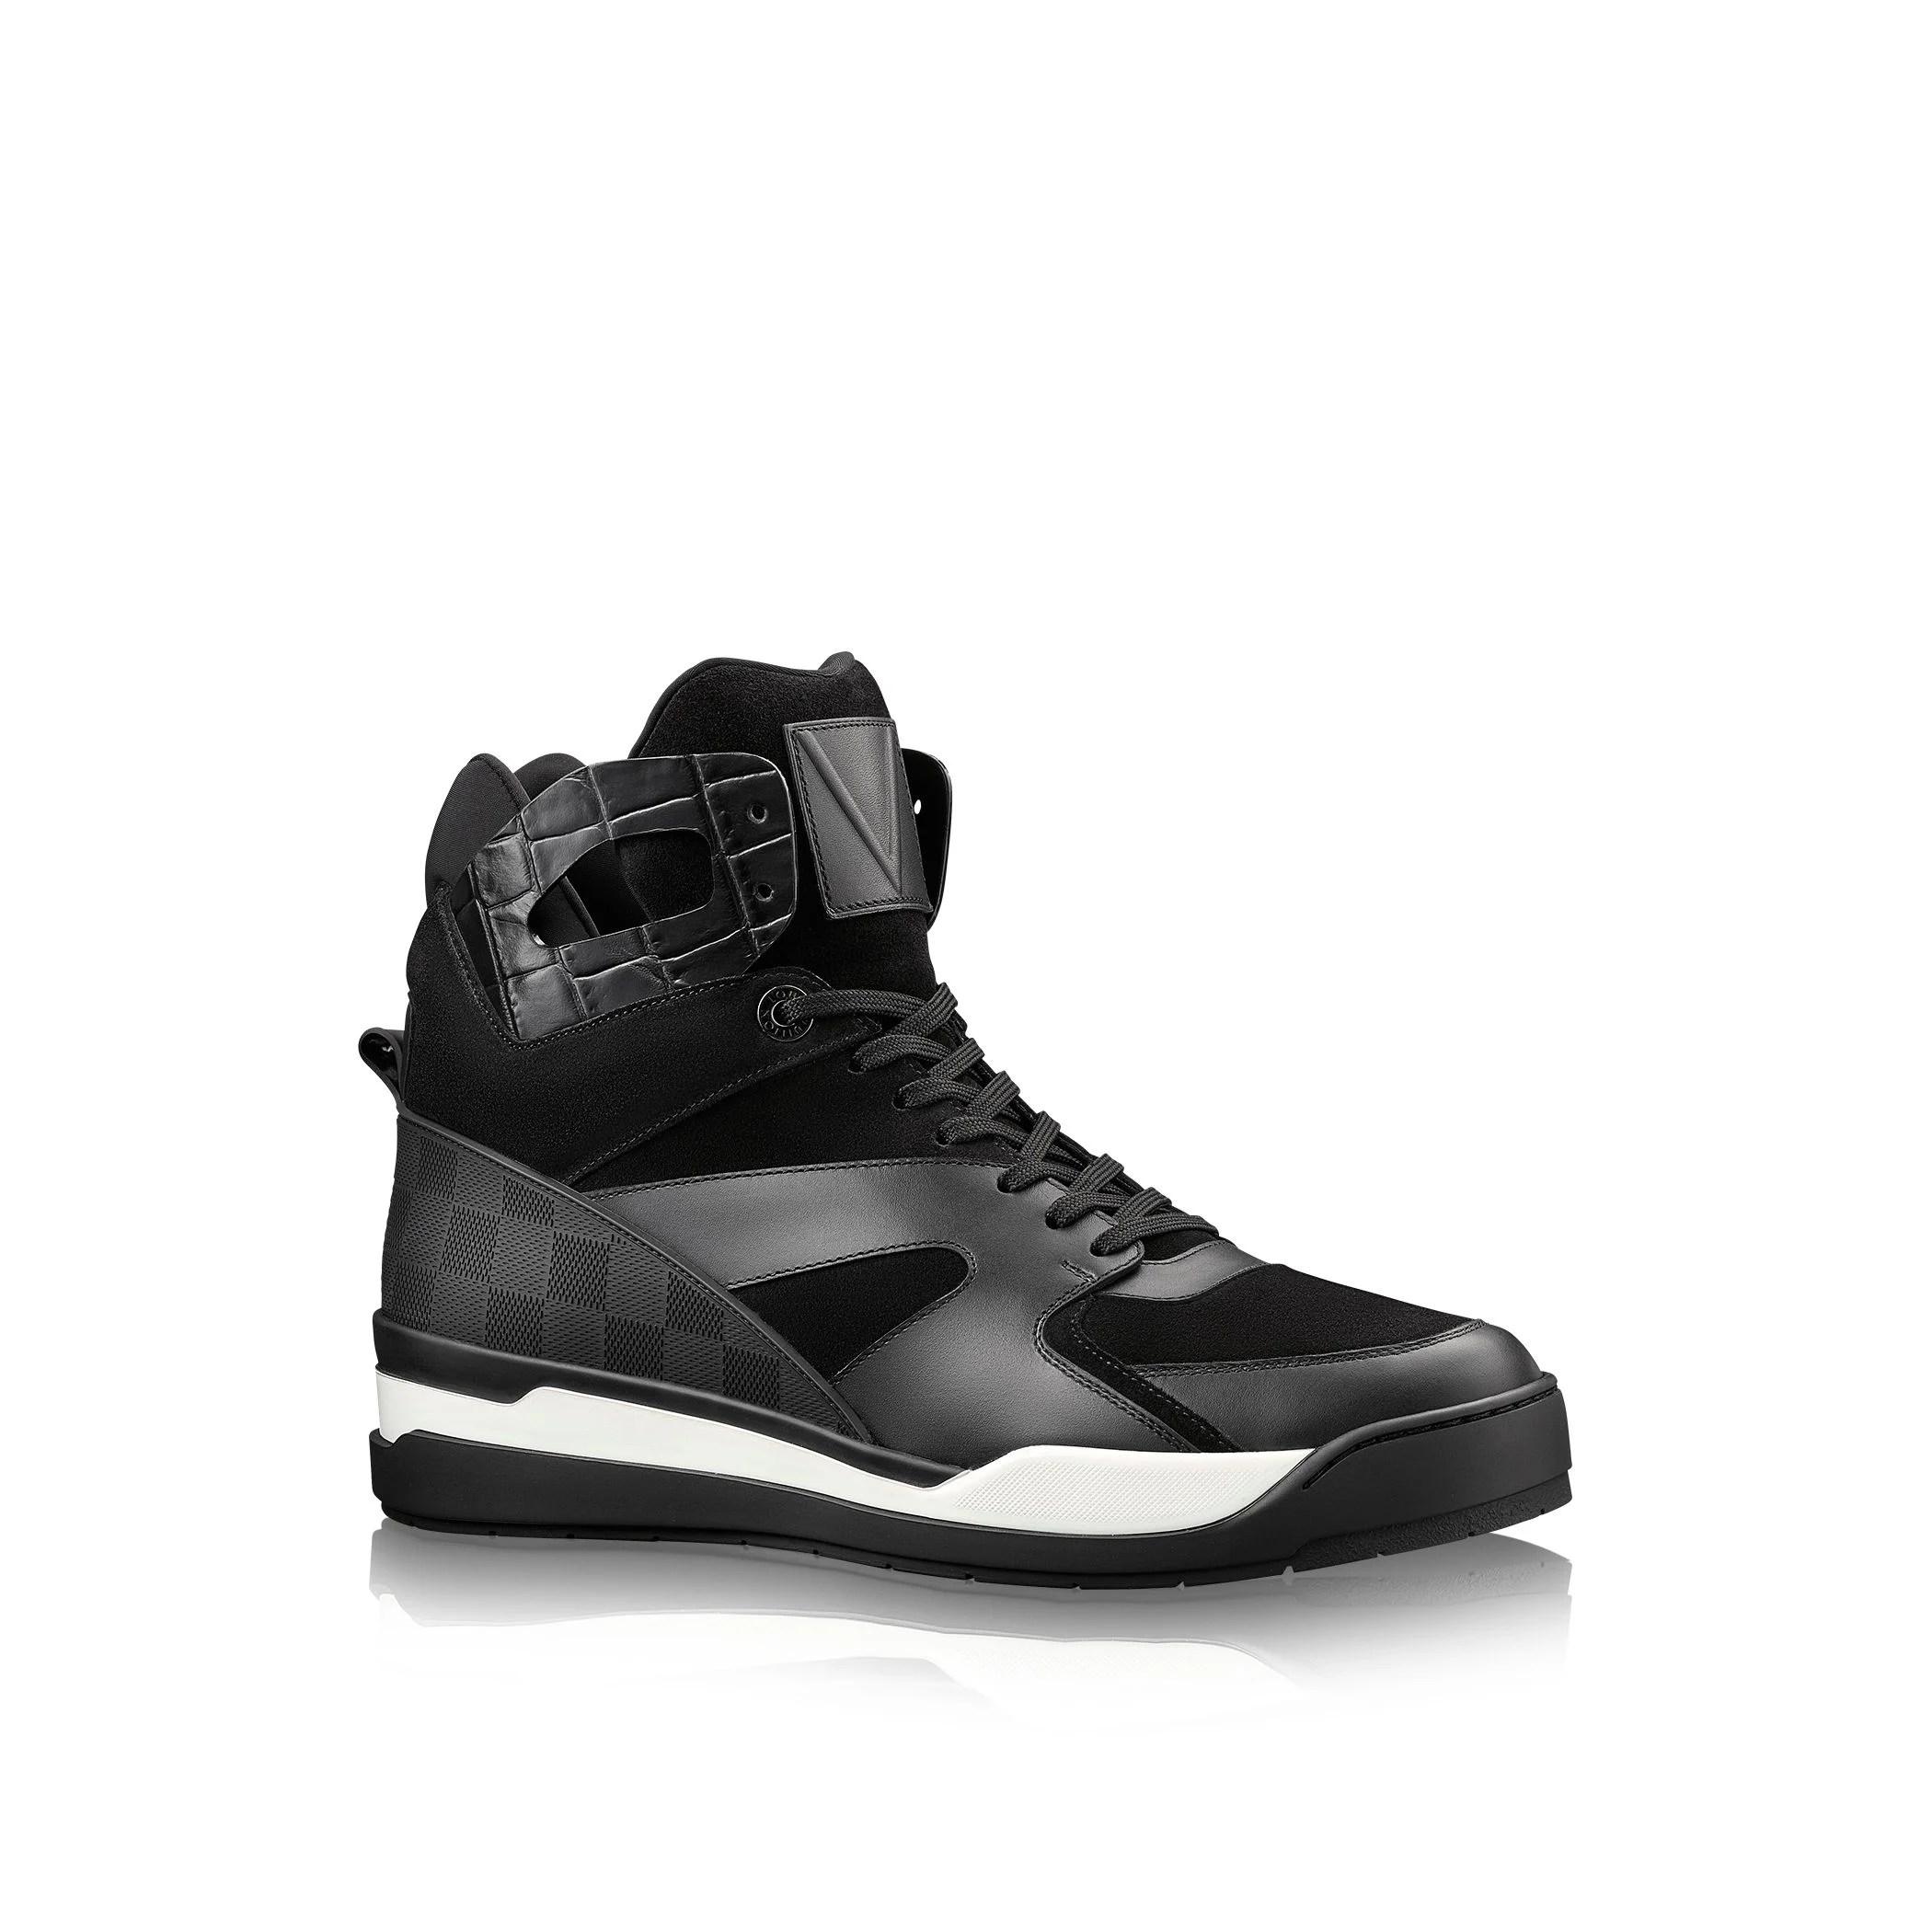 Louis Vuitton Kick Off Sneaker Boot In Black For Men Lyst